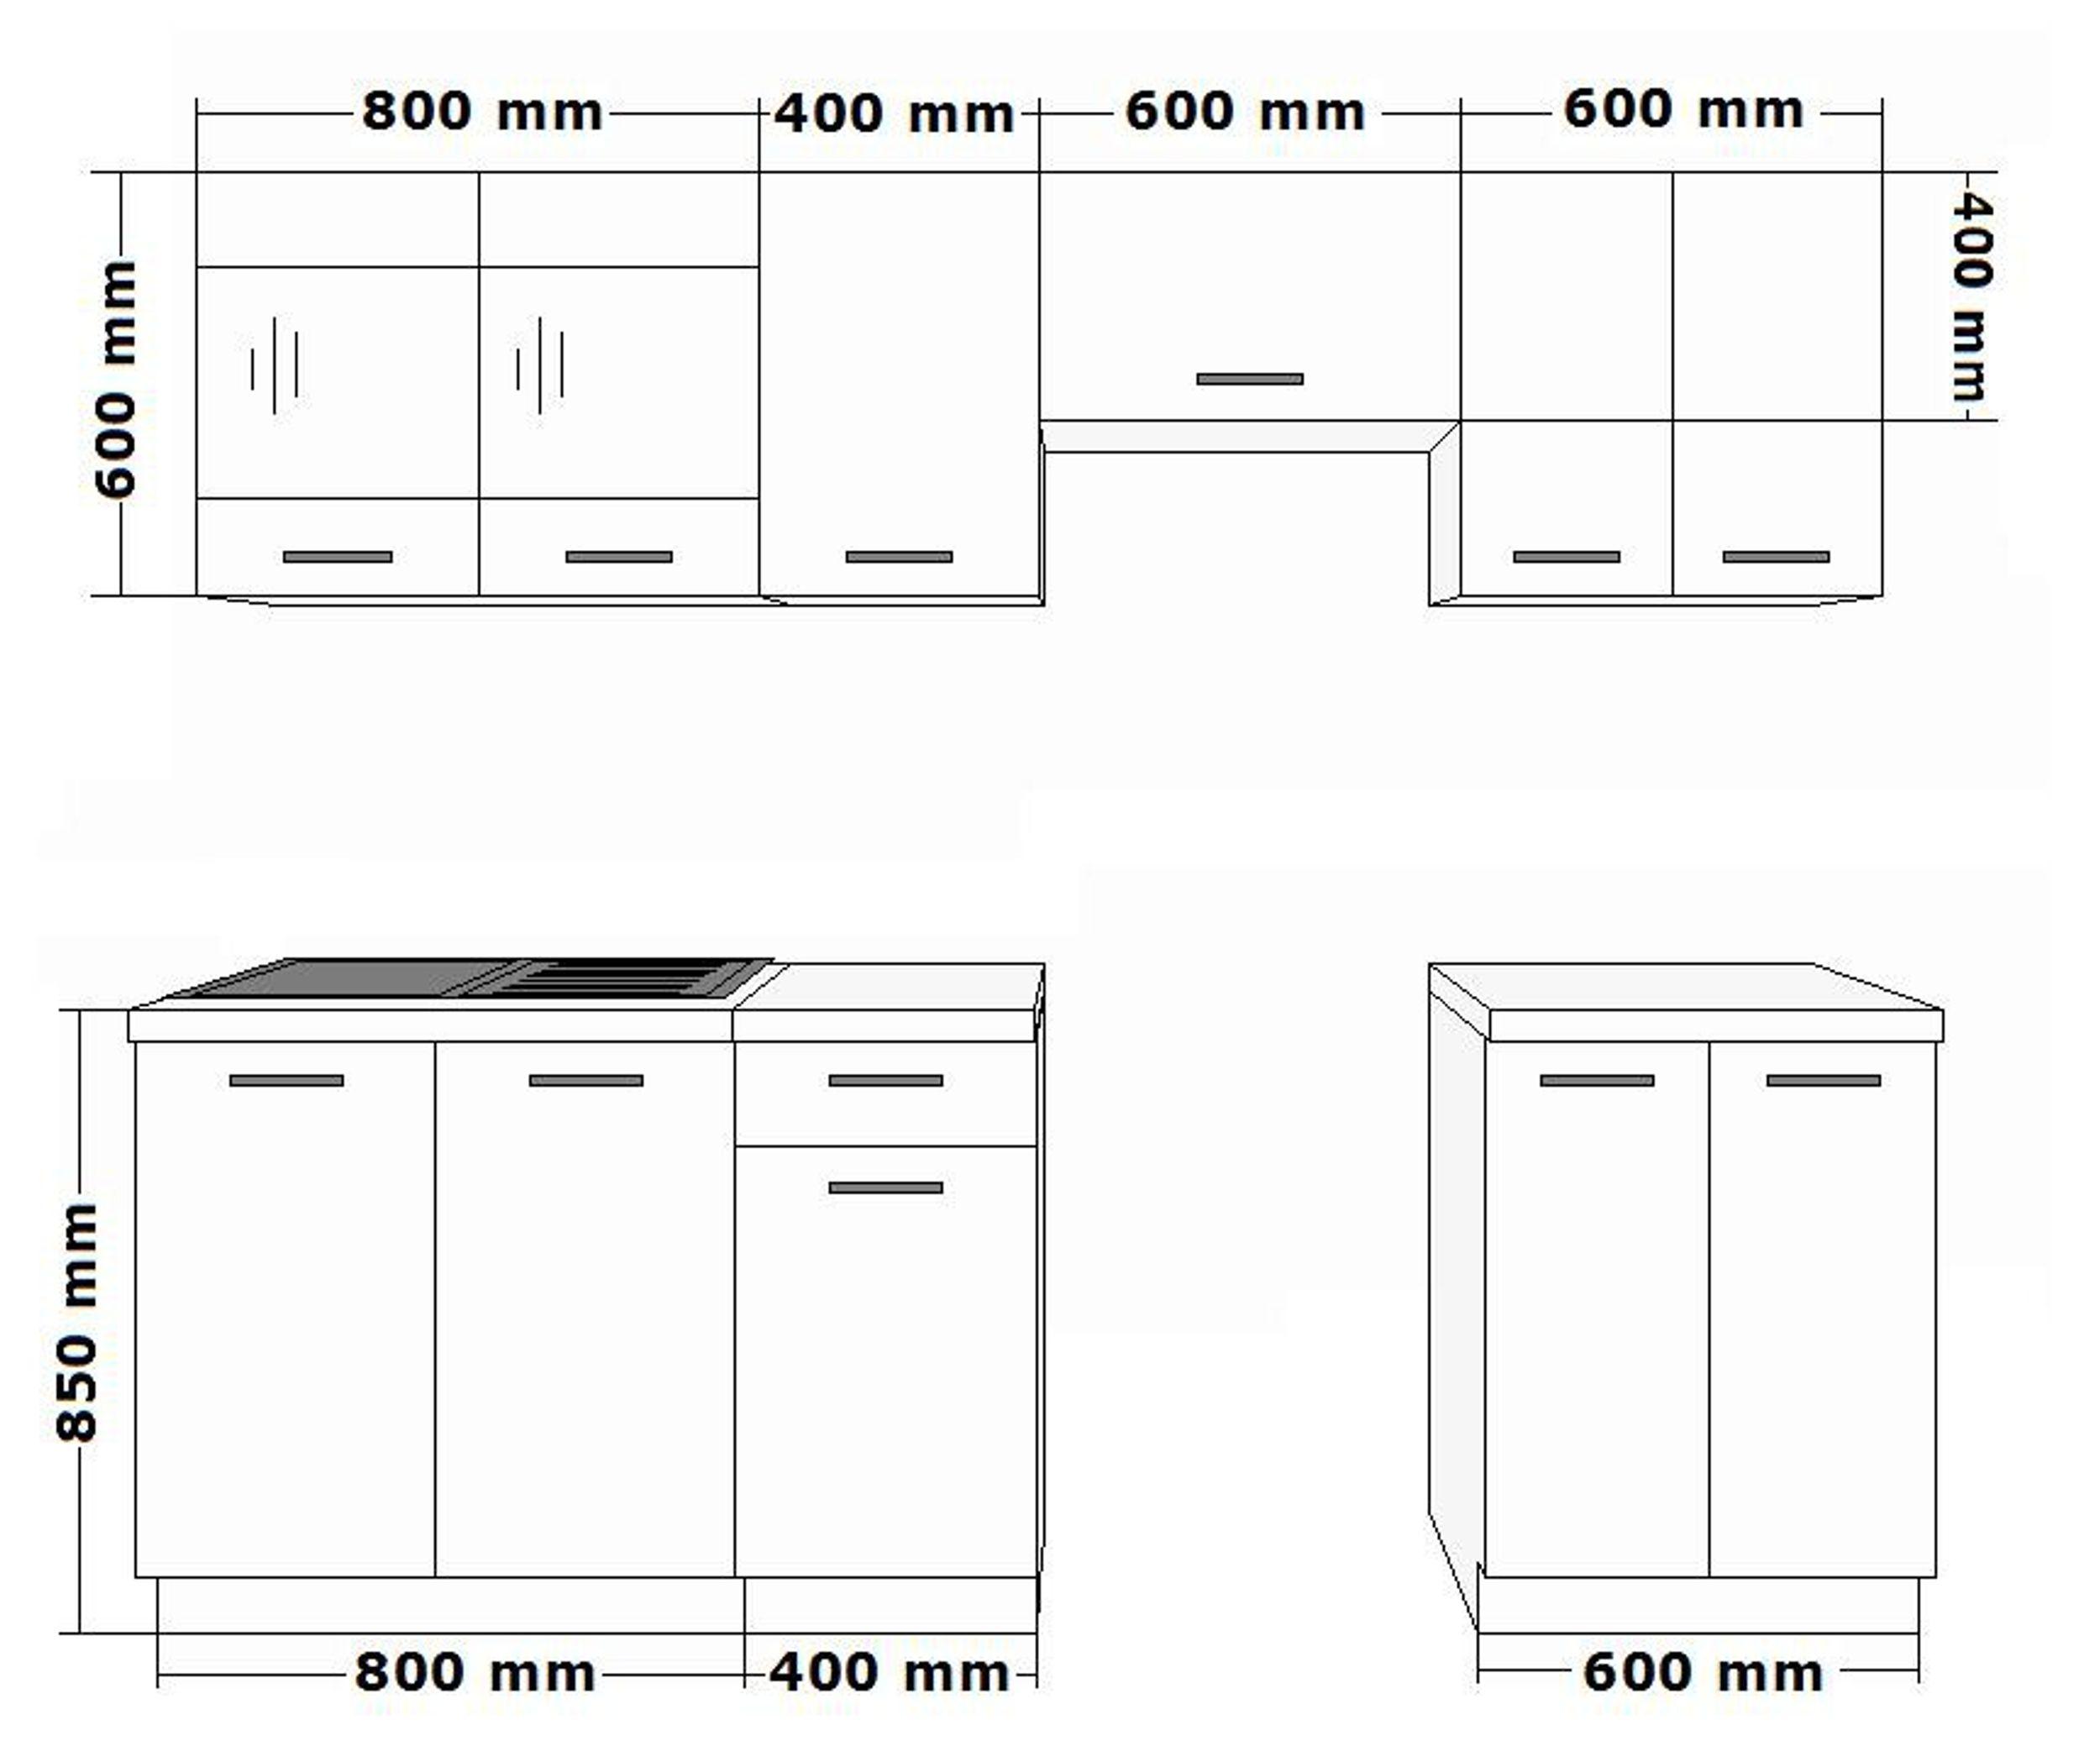 Maße Küchenschränke | acjsilva.com